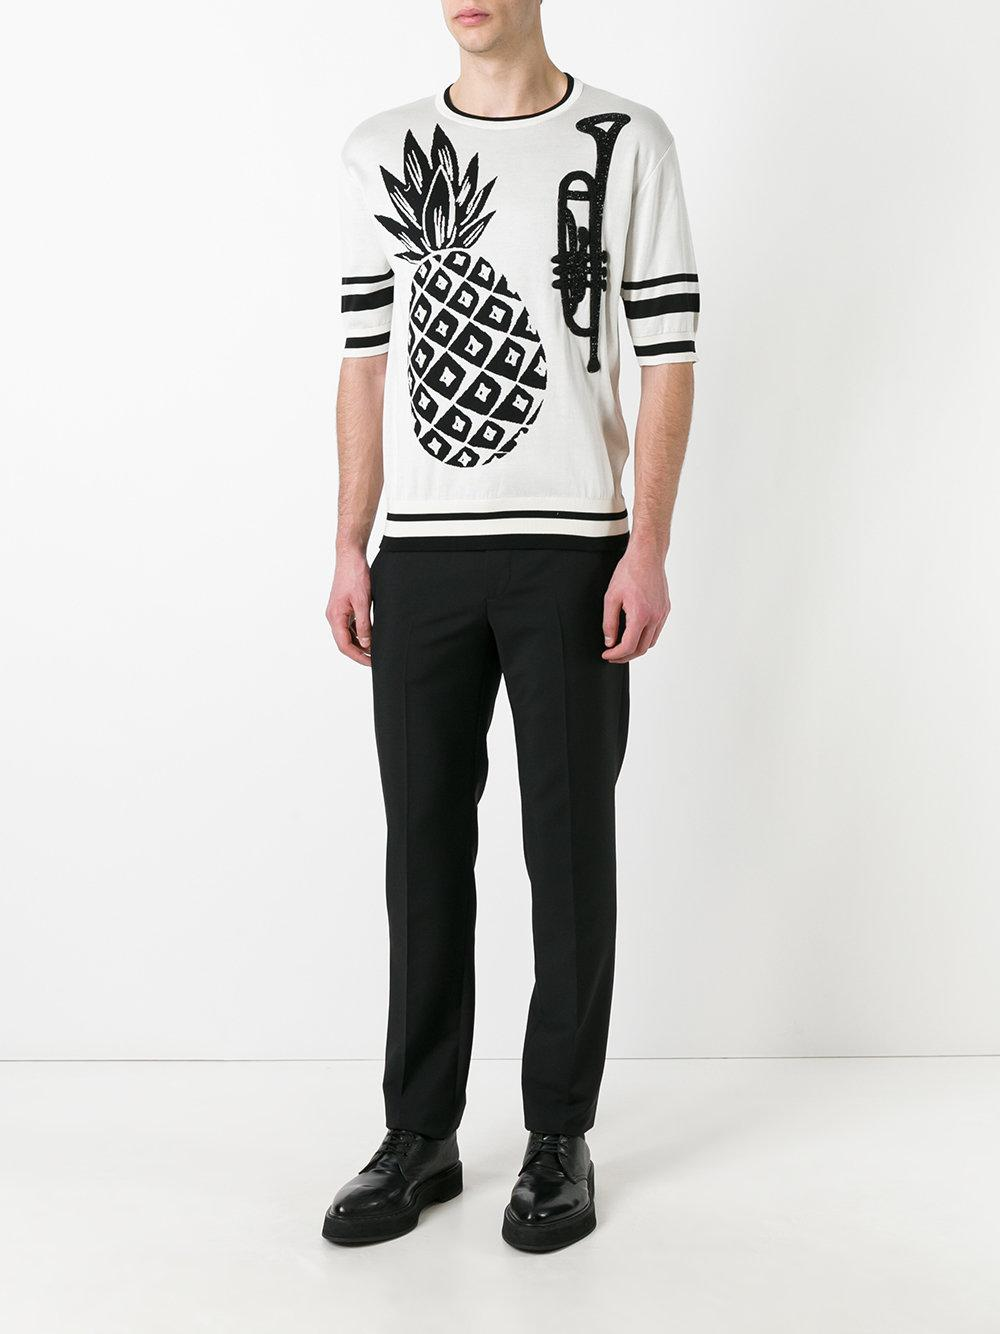 Dolce & Gabbana Silk Pineapple Intarsia Knit Top in White for Men